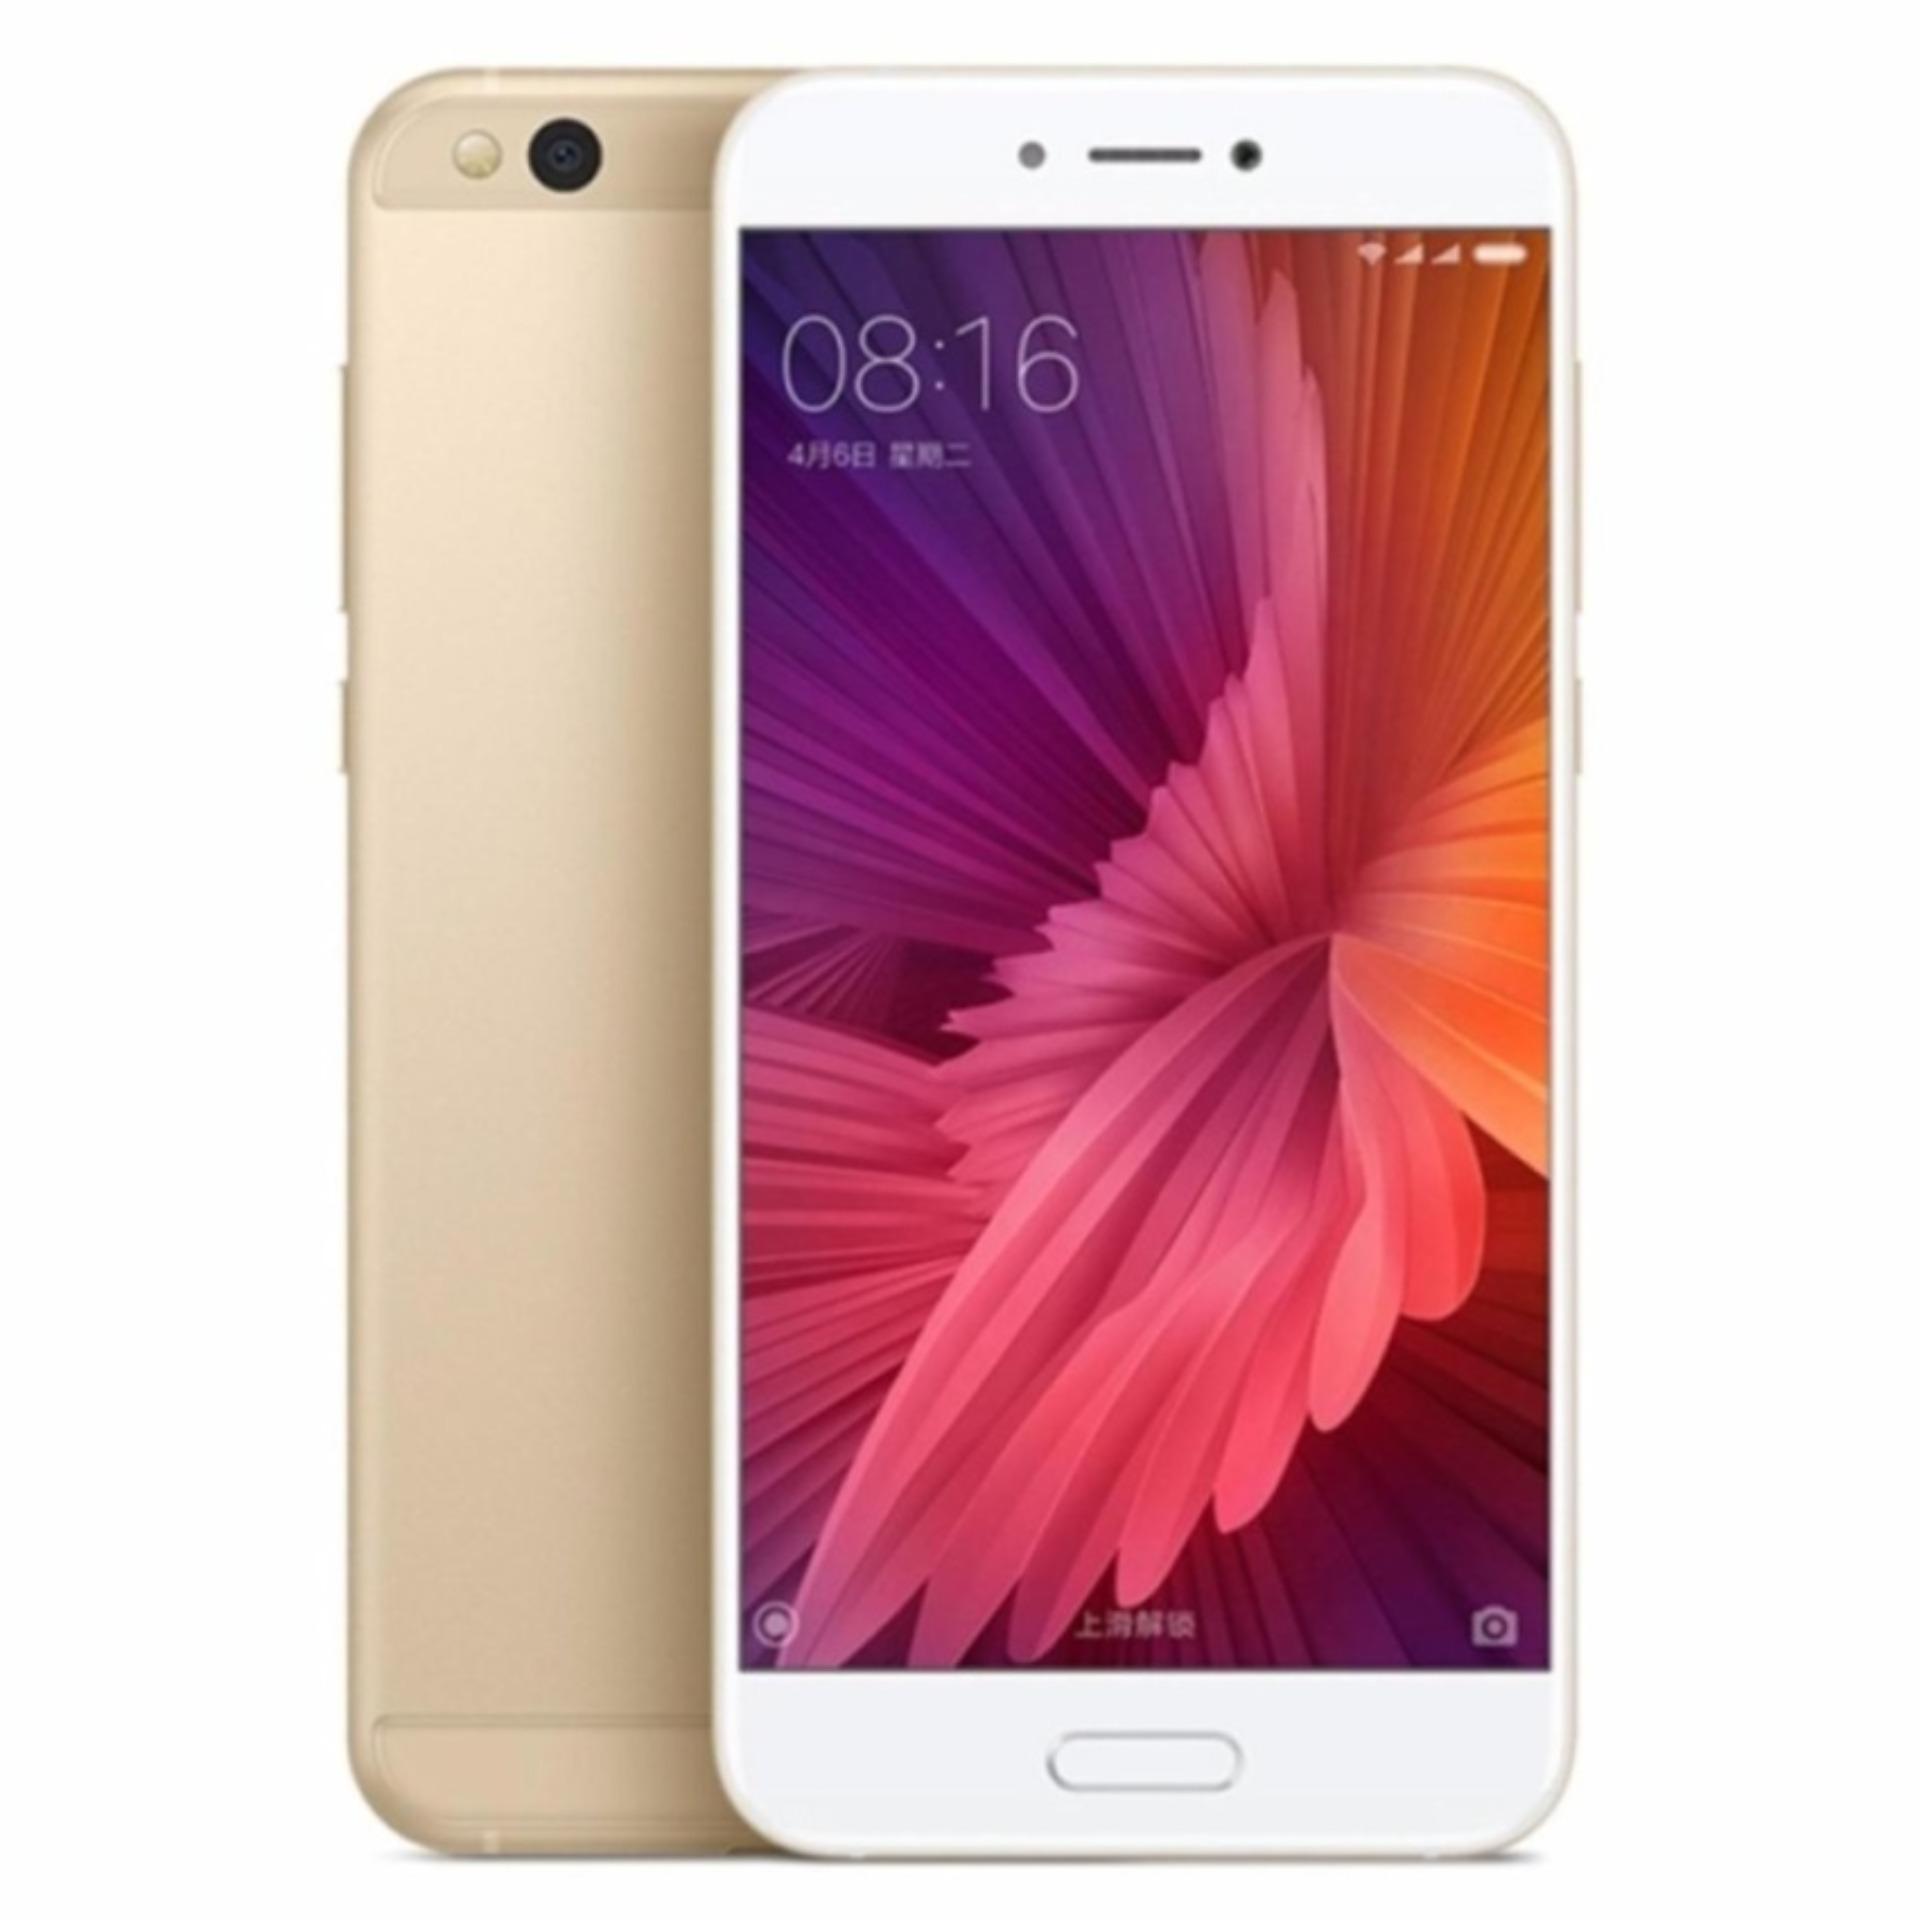 Murah Xiaomi Redmi 4a Prime Ram 2gb Rom 32gb Gold Gudang 2 16 Gb Garansi Distributor 3gb 64gb Mi 5c 1 Tahun